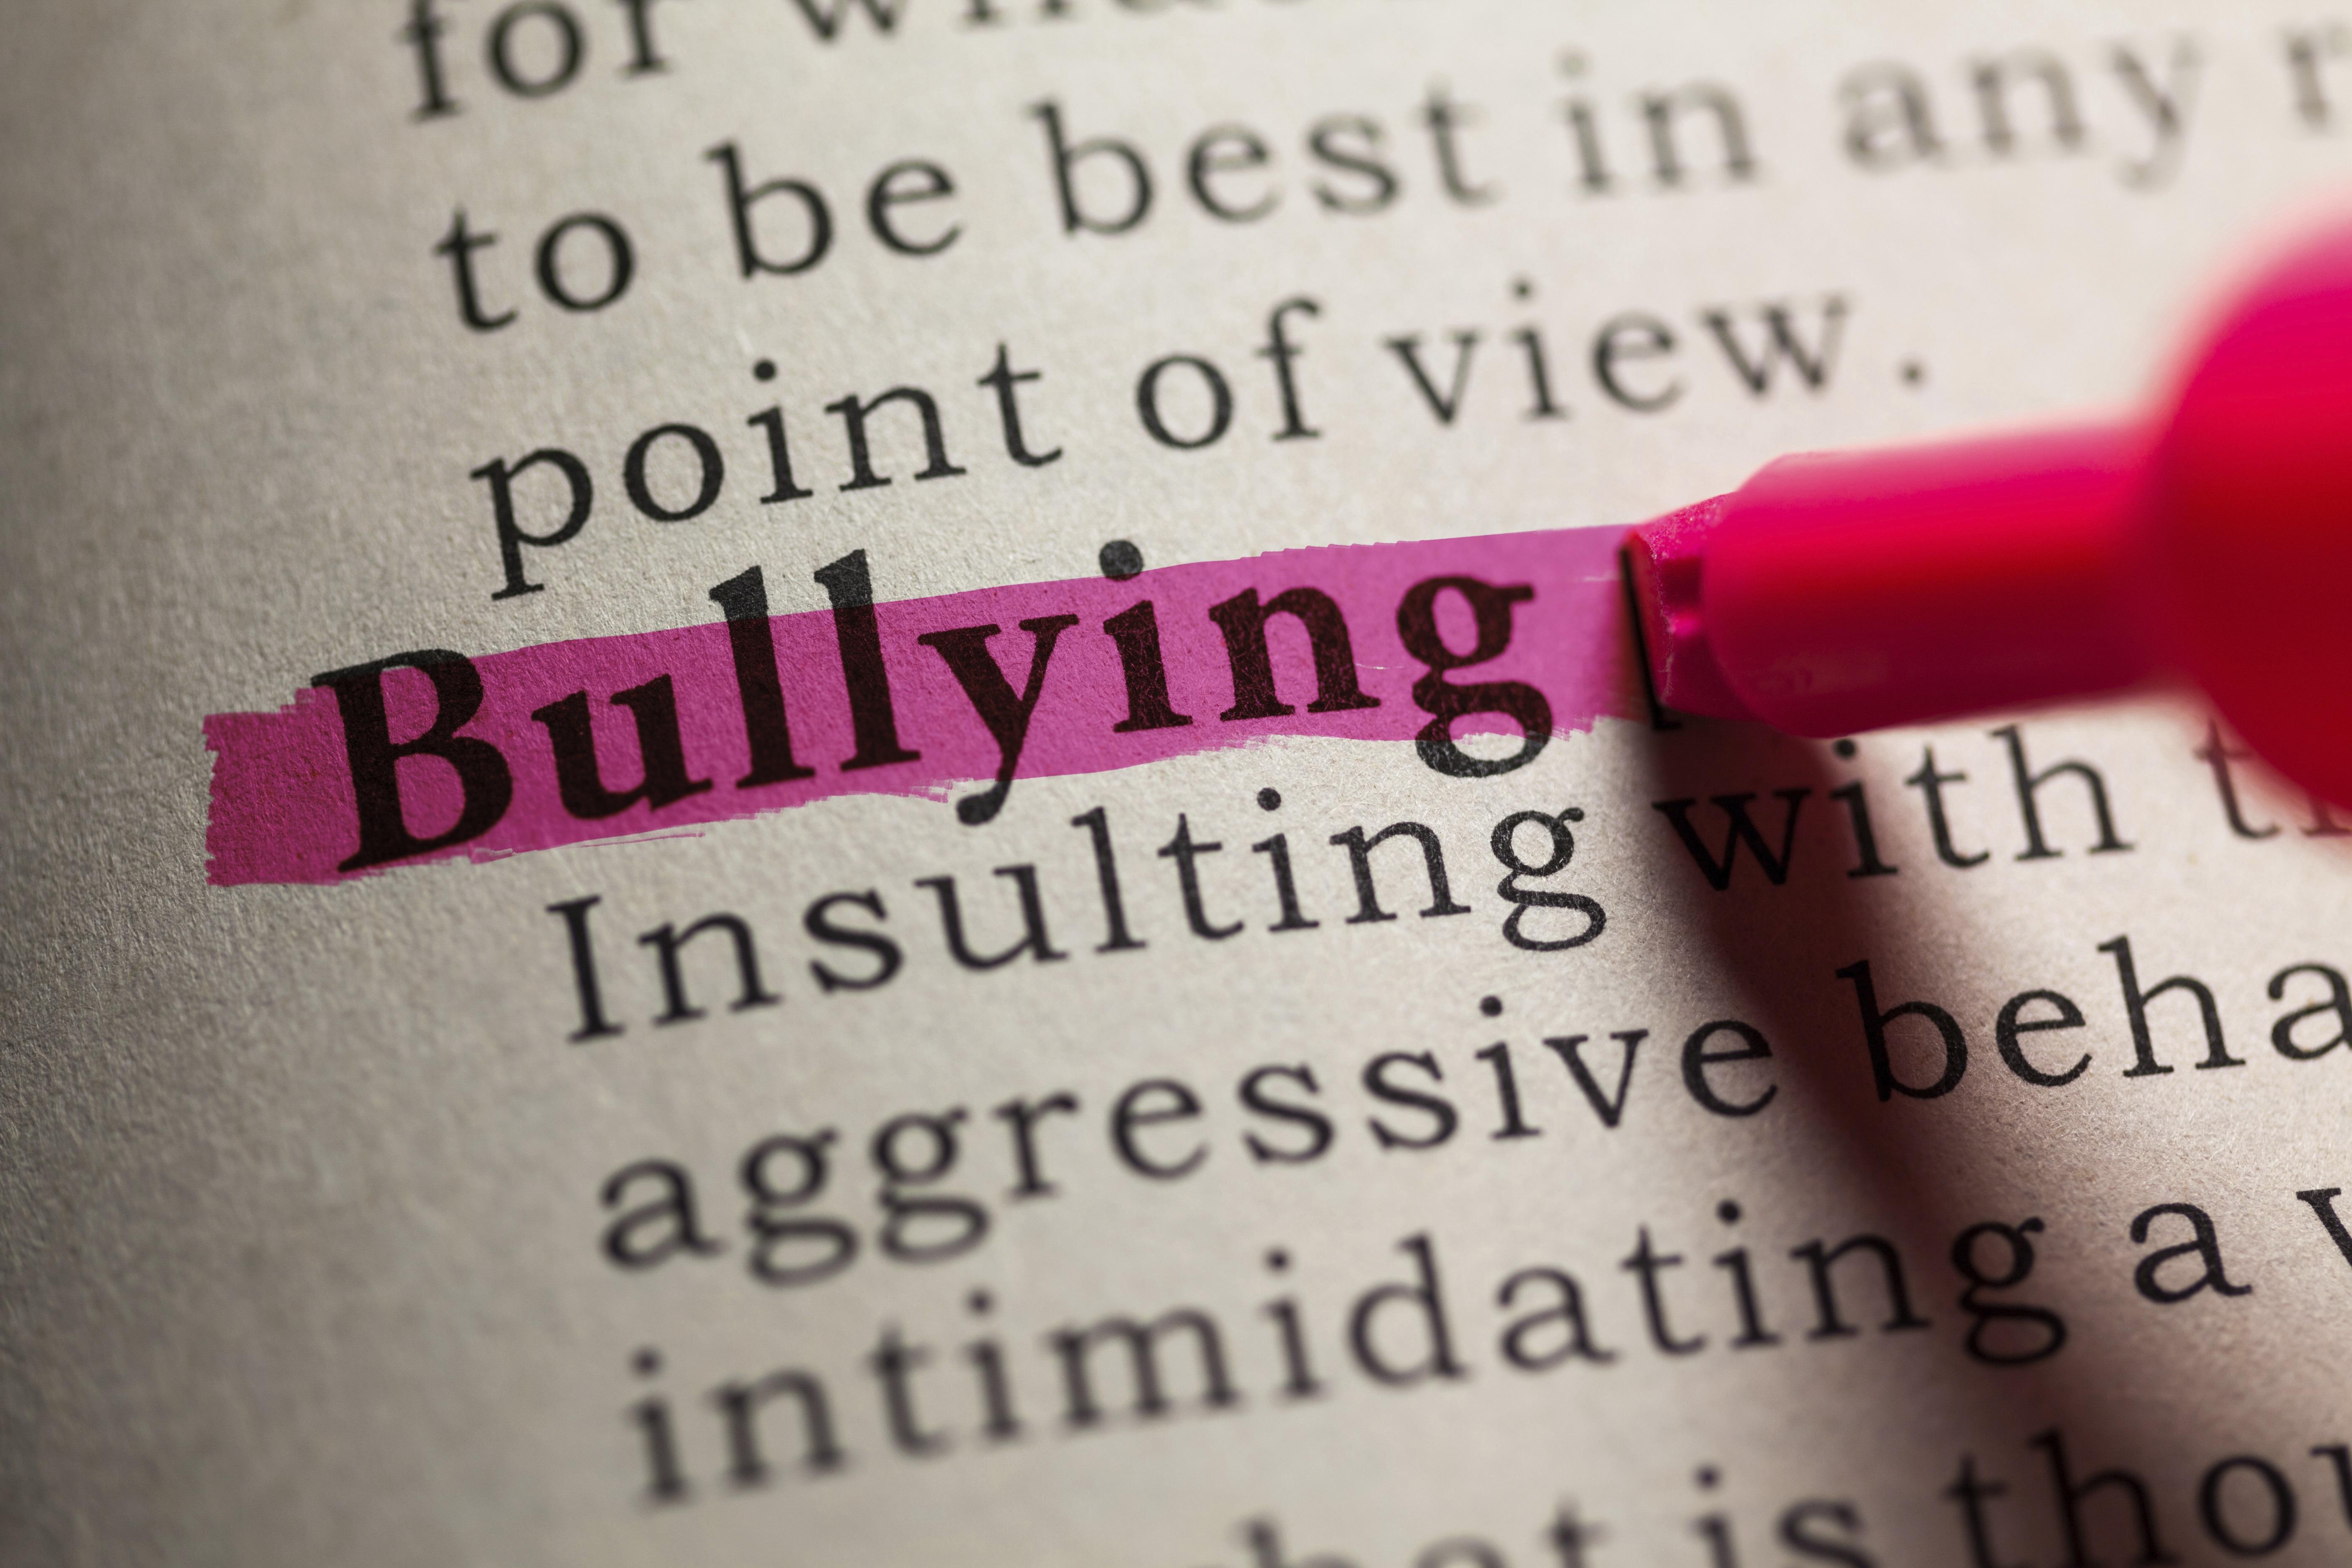 122-1-parent-social-bullies-ss-122-definition-of-bullying-jpg – additude